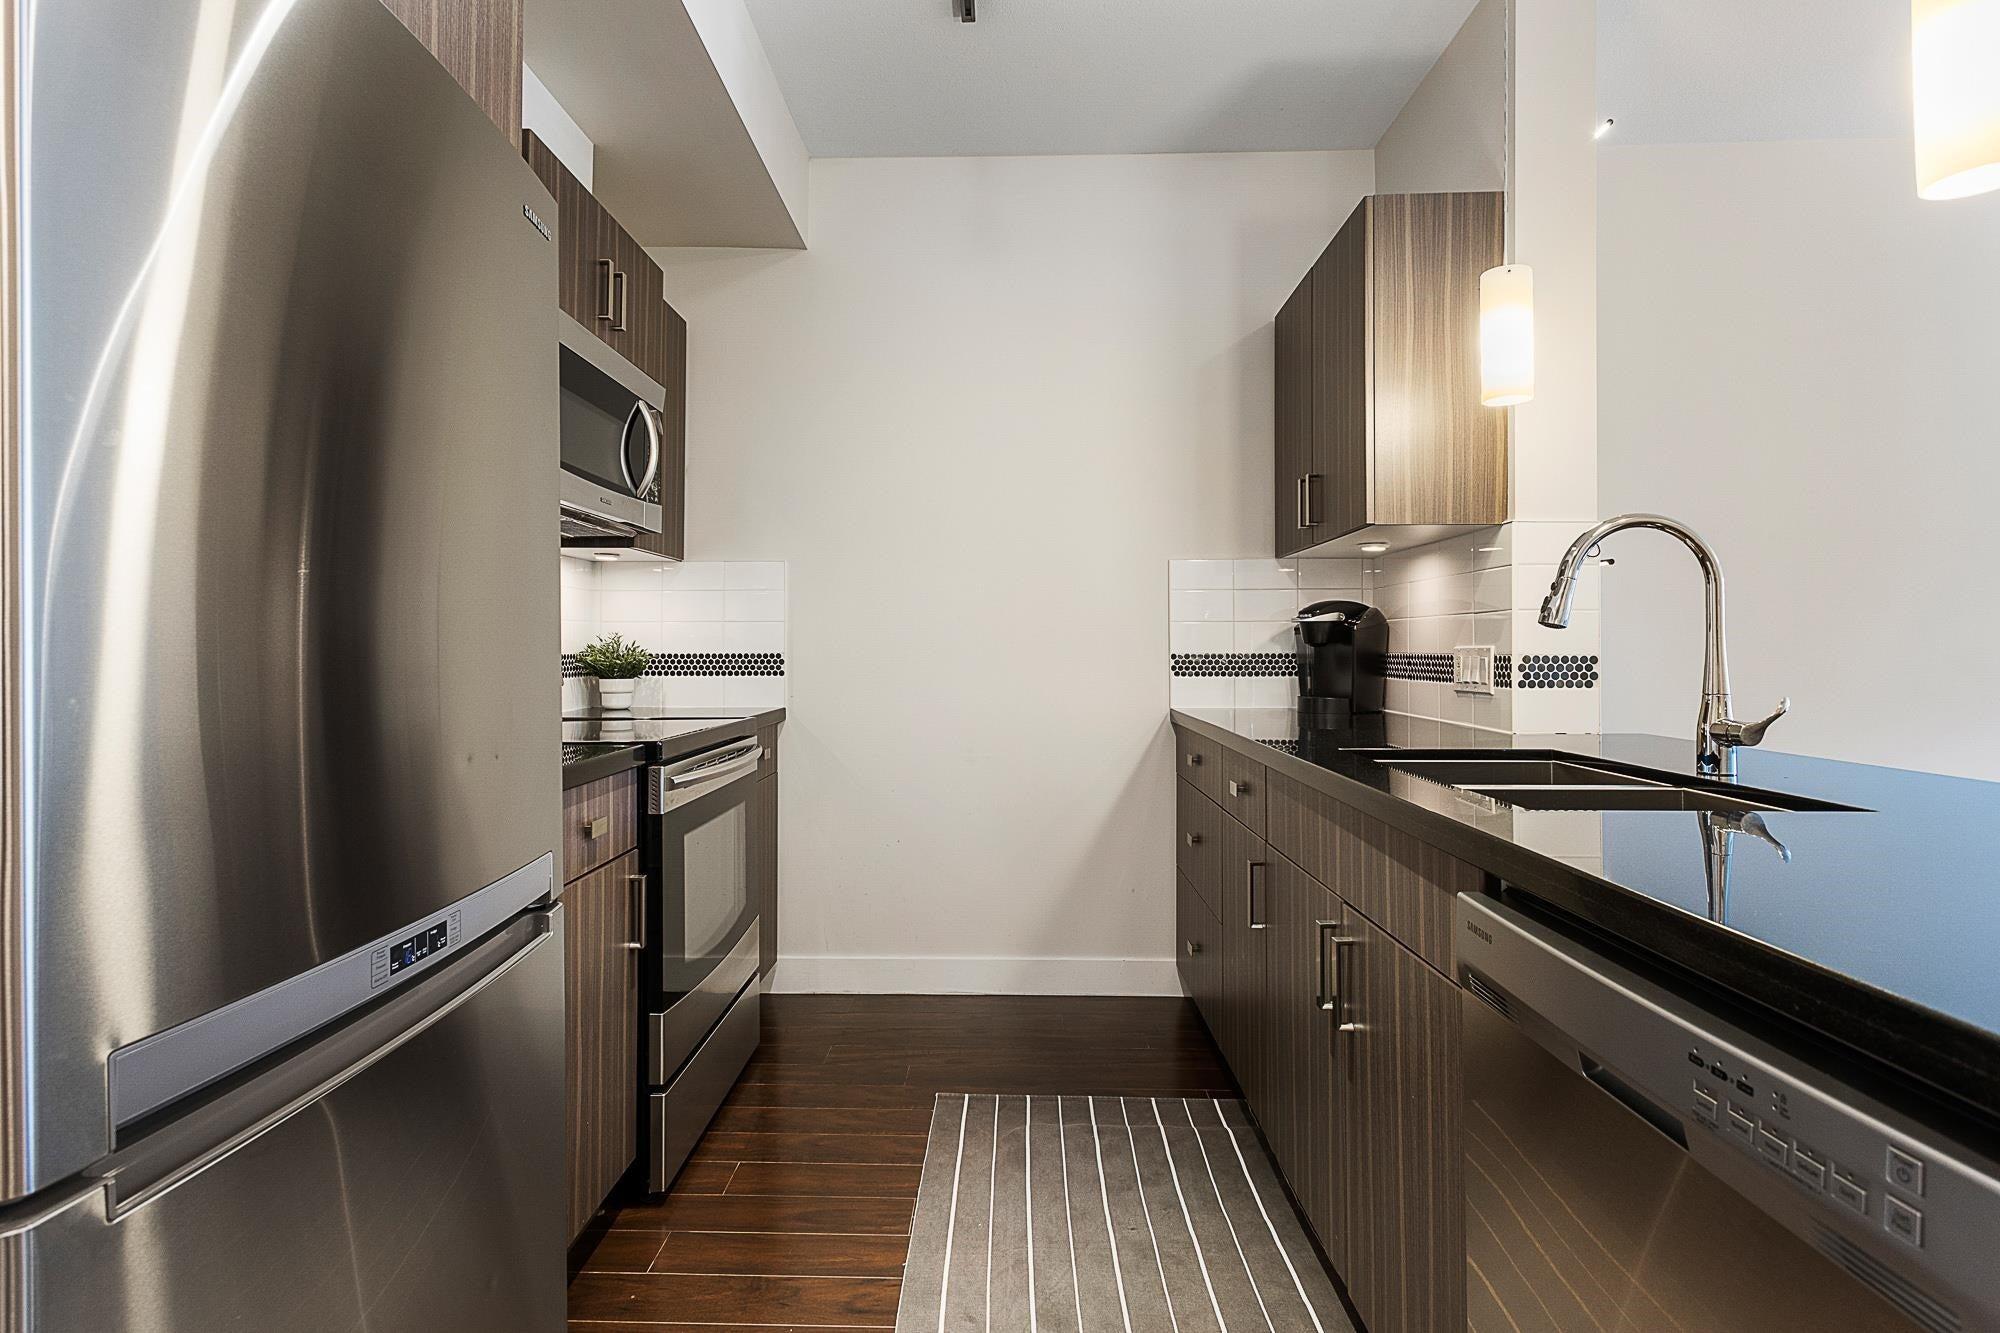 114 20219 54A AVENUE - Langley City Apartment/Condo for sale, 1 Bedroom (R2616172) - #5